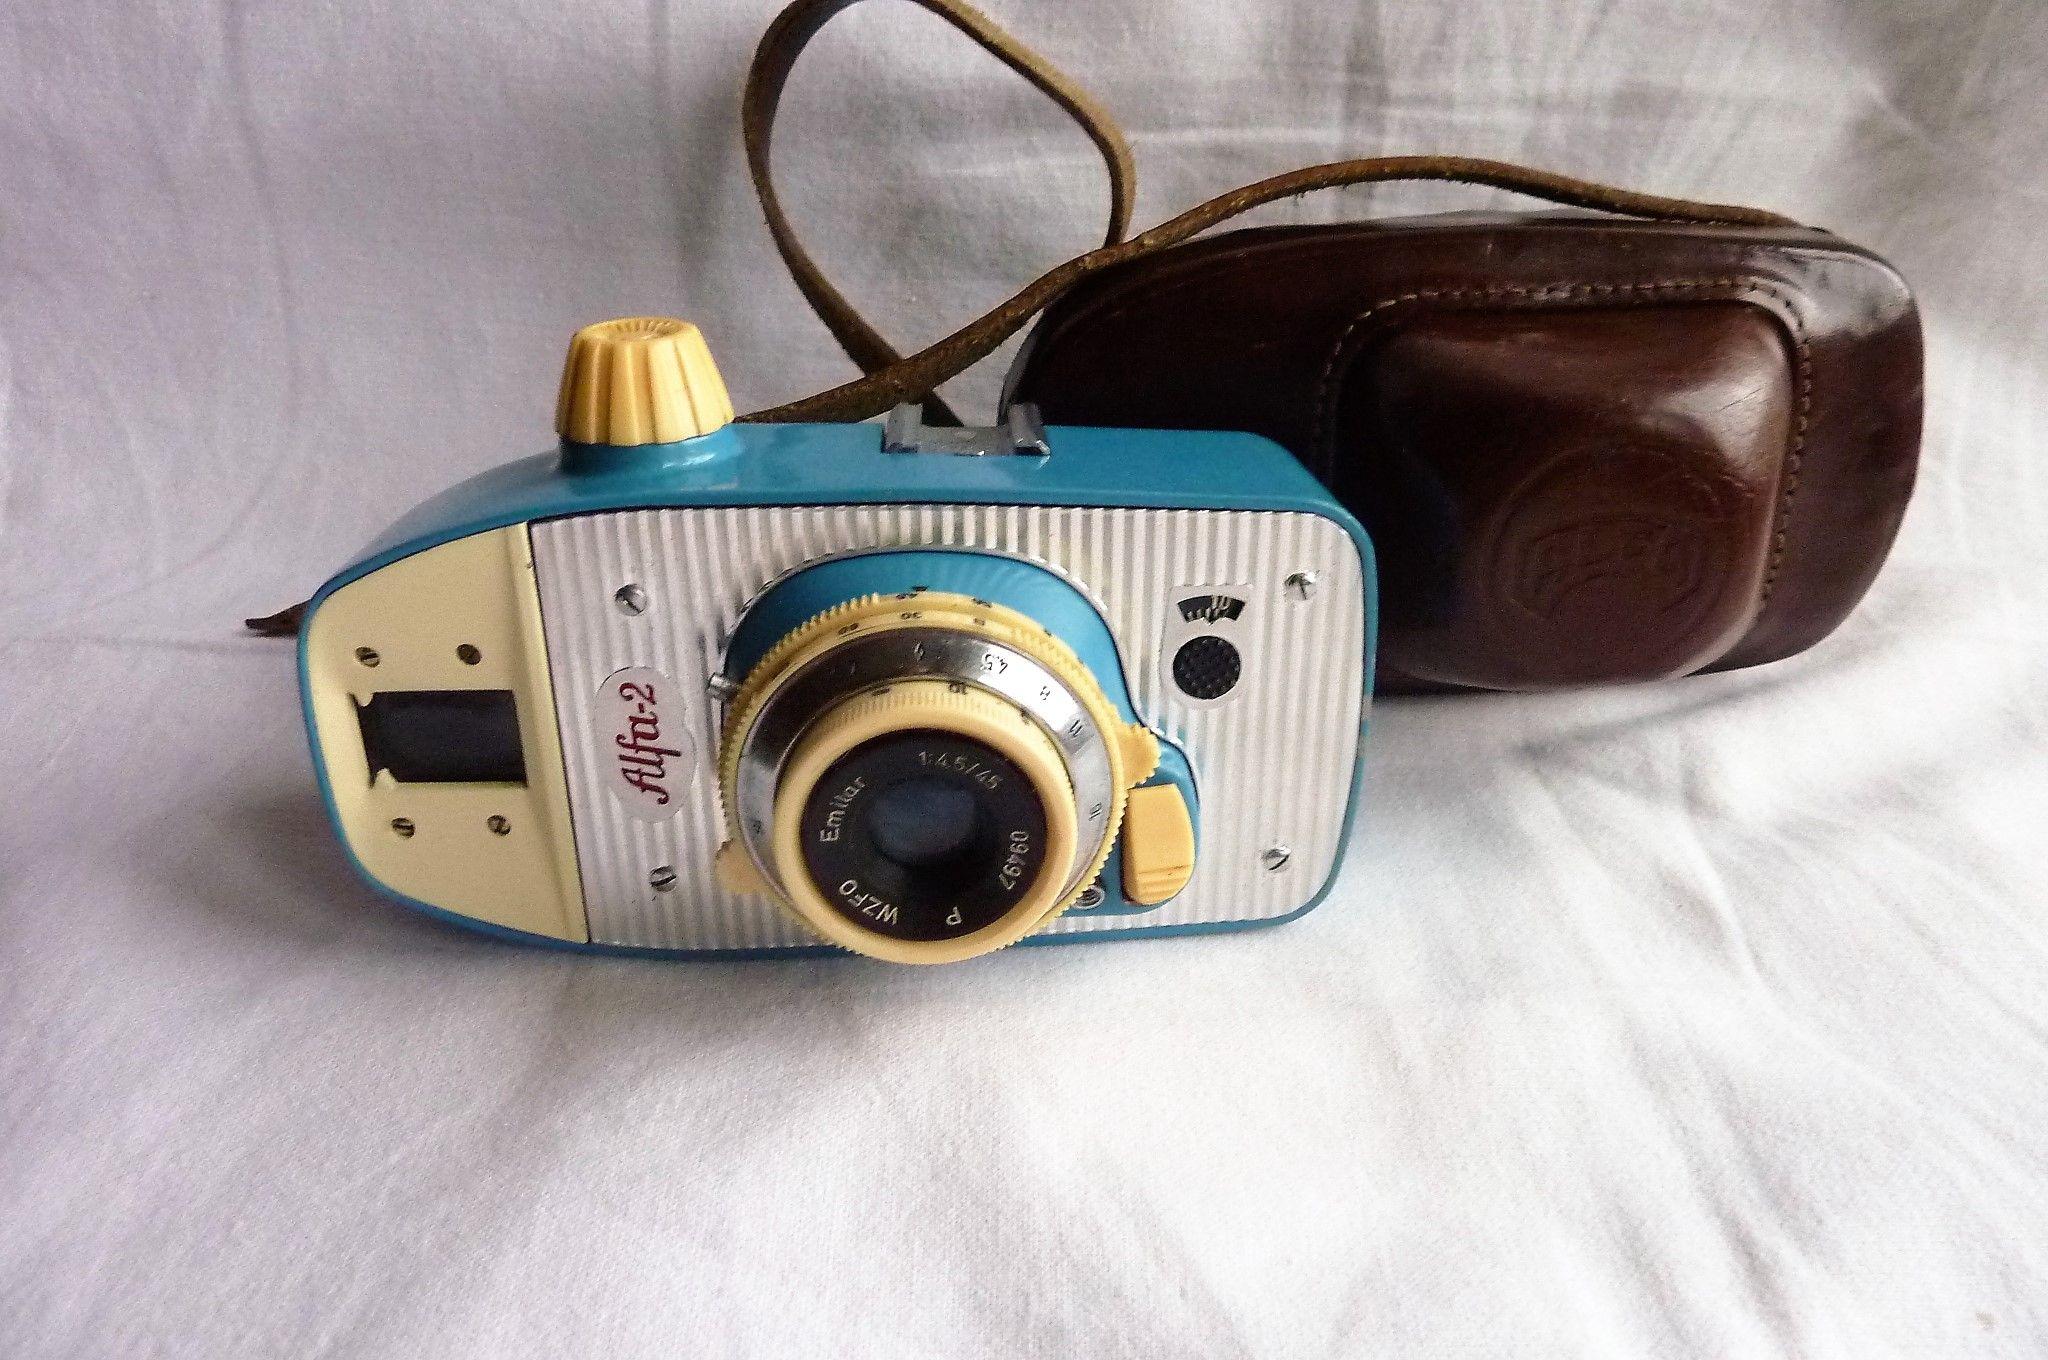 Alfa 2 Jasno Niebieska Bardzo Ladna 6628327146 Oficjalne Archiwum Allegro Vintage Camera Instax Mini Fujifilm Instax Mini